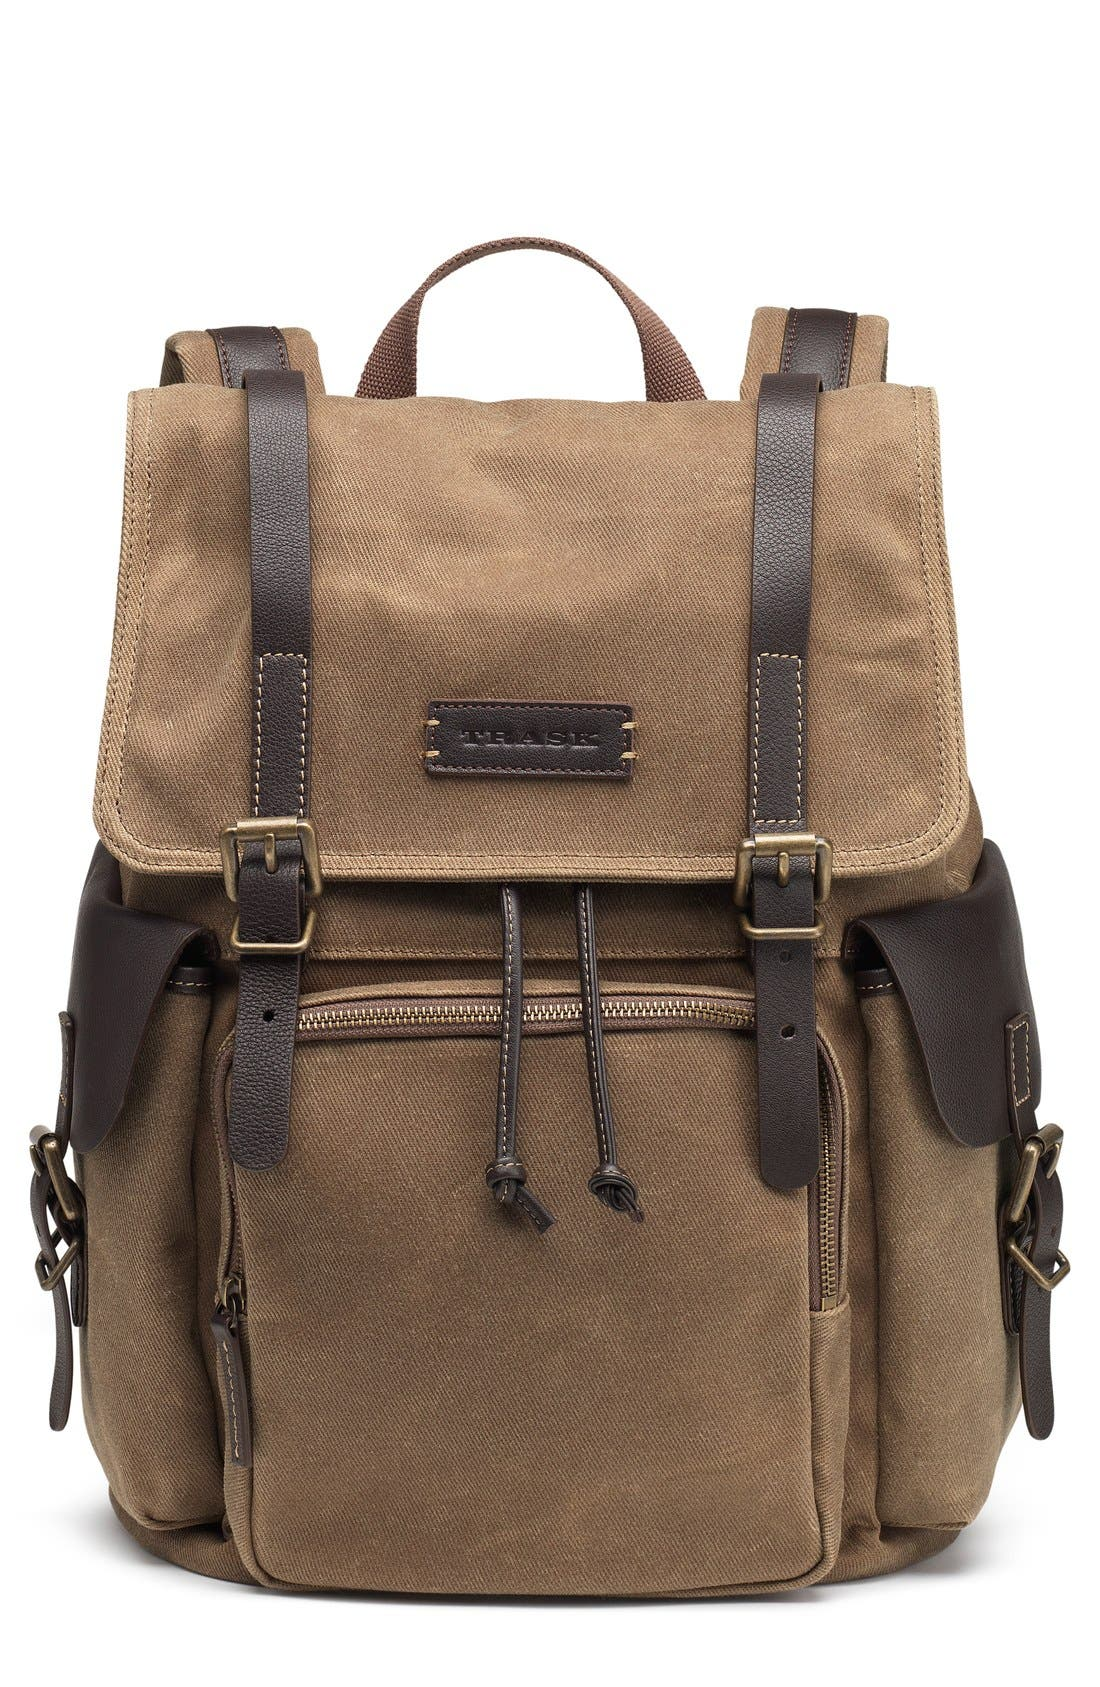 Trask 'Bridger' Waxed Canvas Backpack